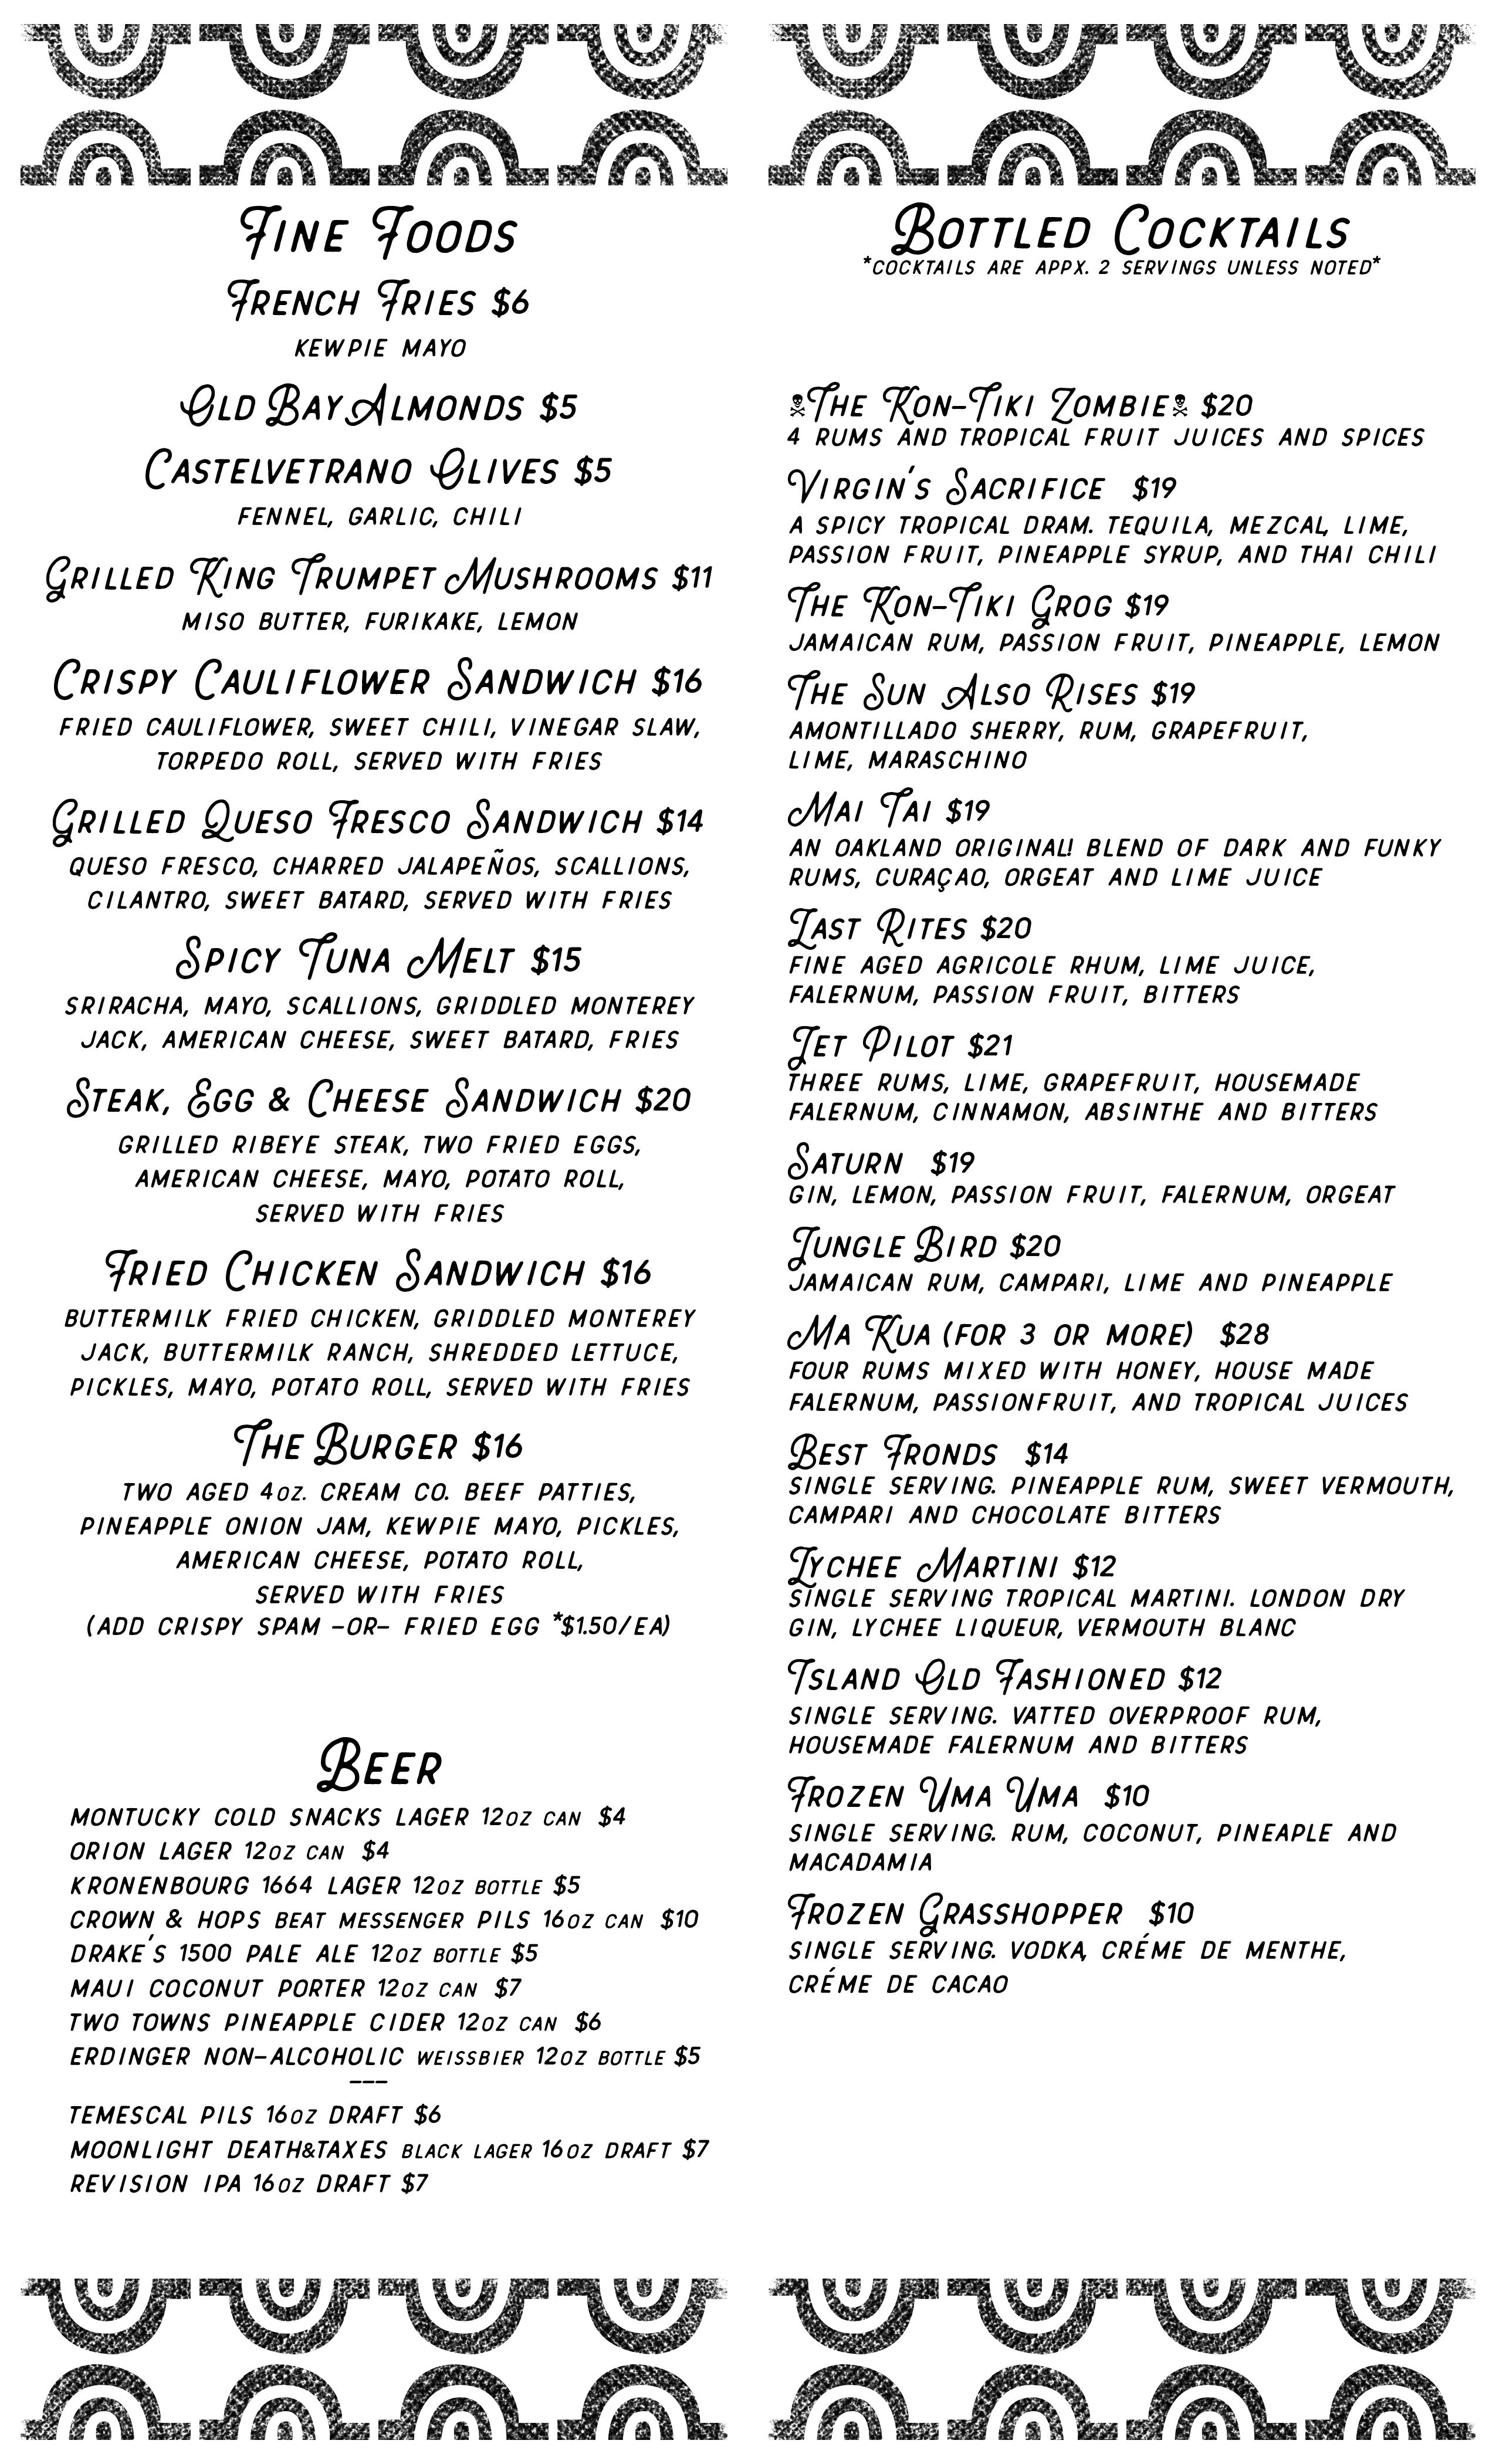 menu of togo food and drinks